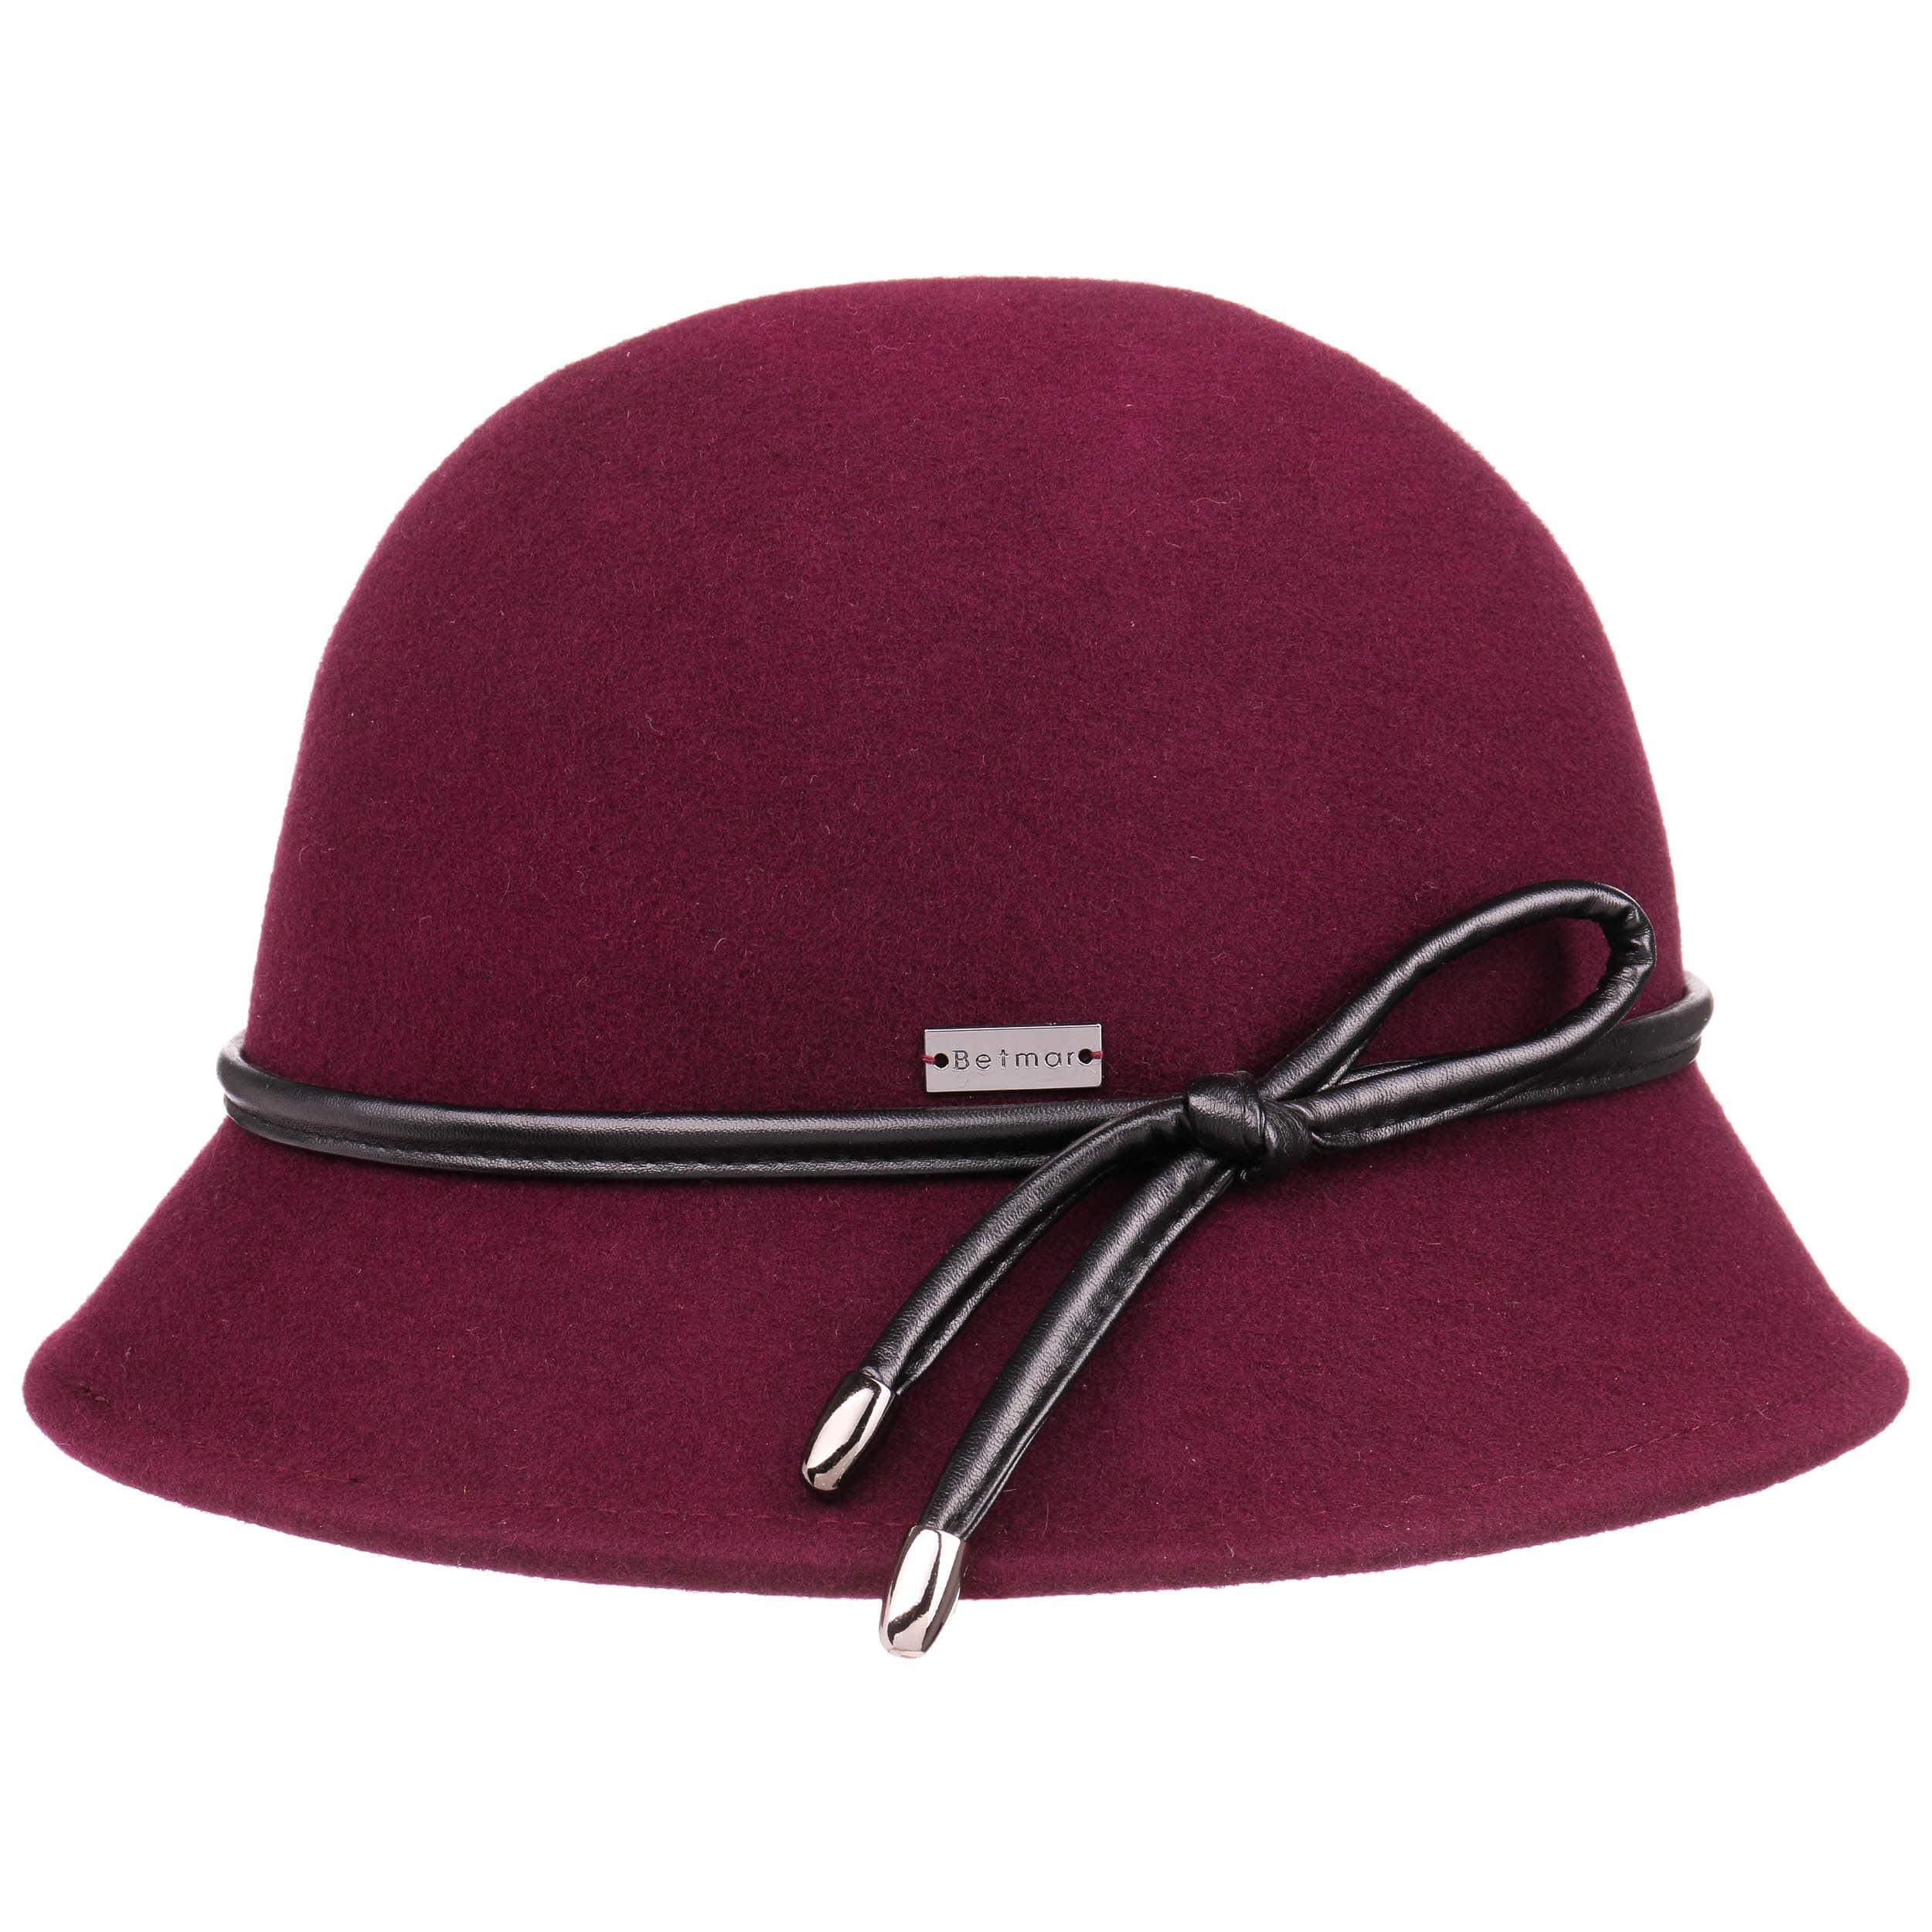 ... Christina Wool Felt Cloche Hat by Betmar - bordeaux 4 ... 975aa92b8bd